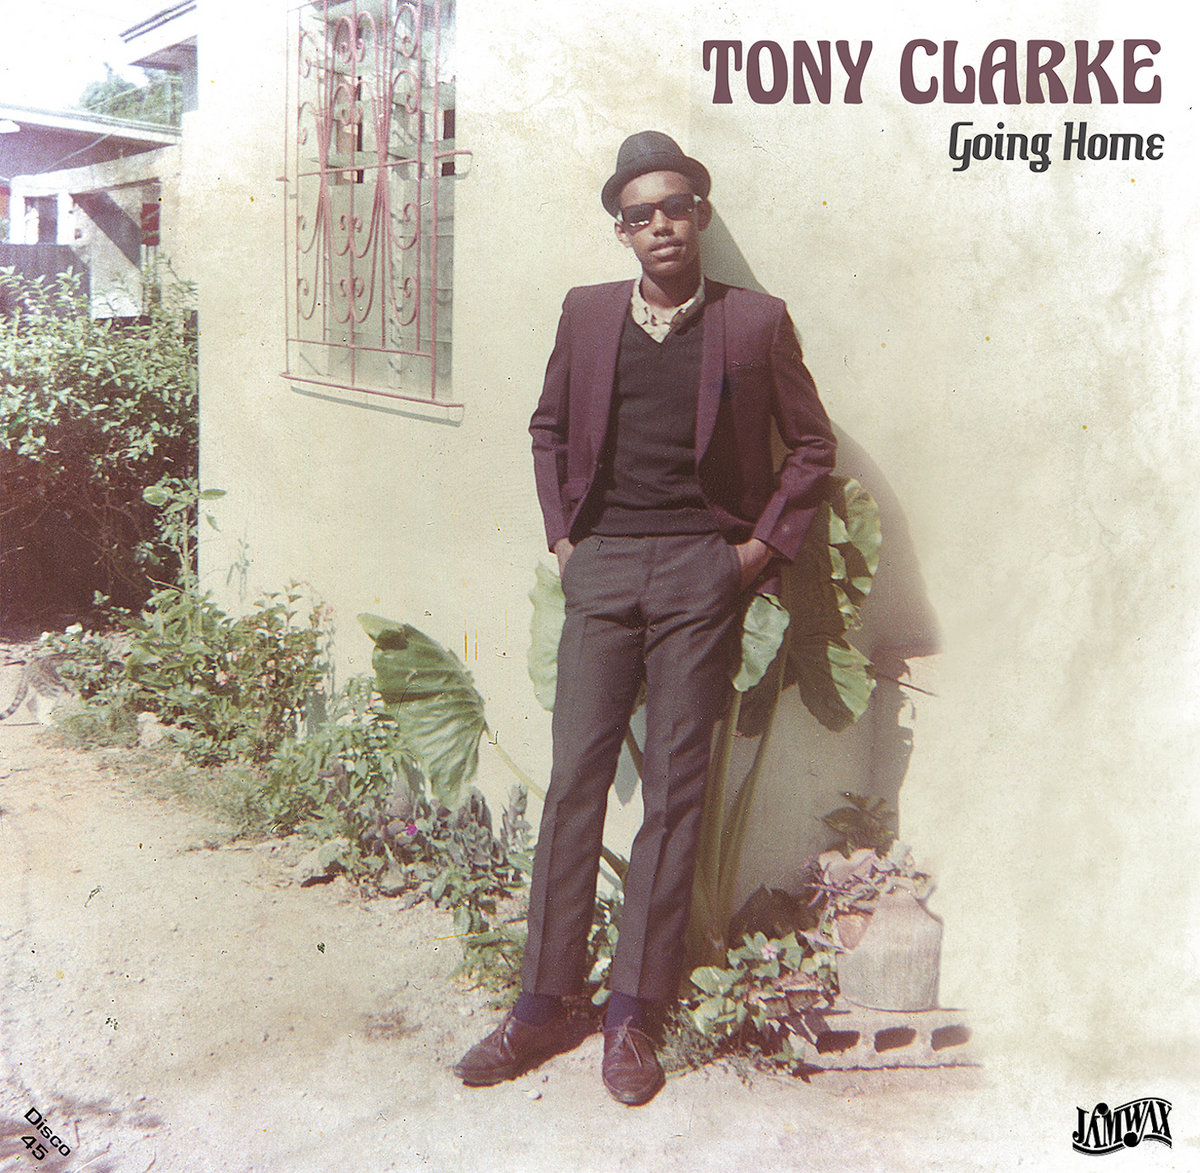 By Tony Clarke